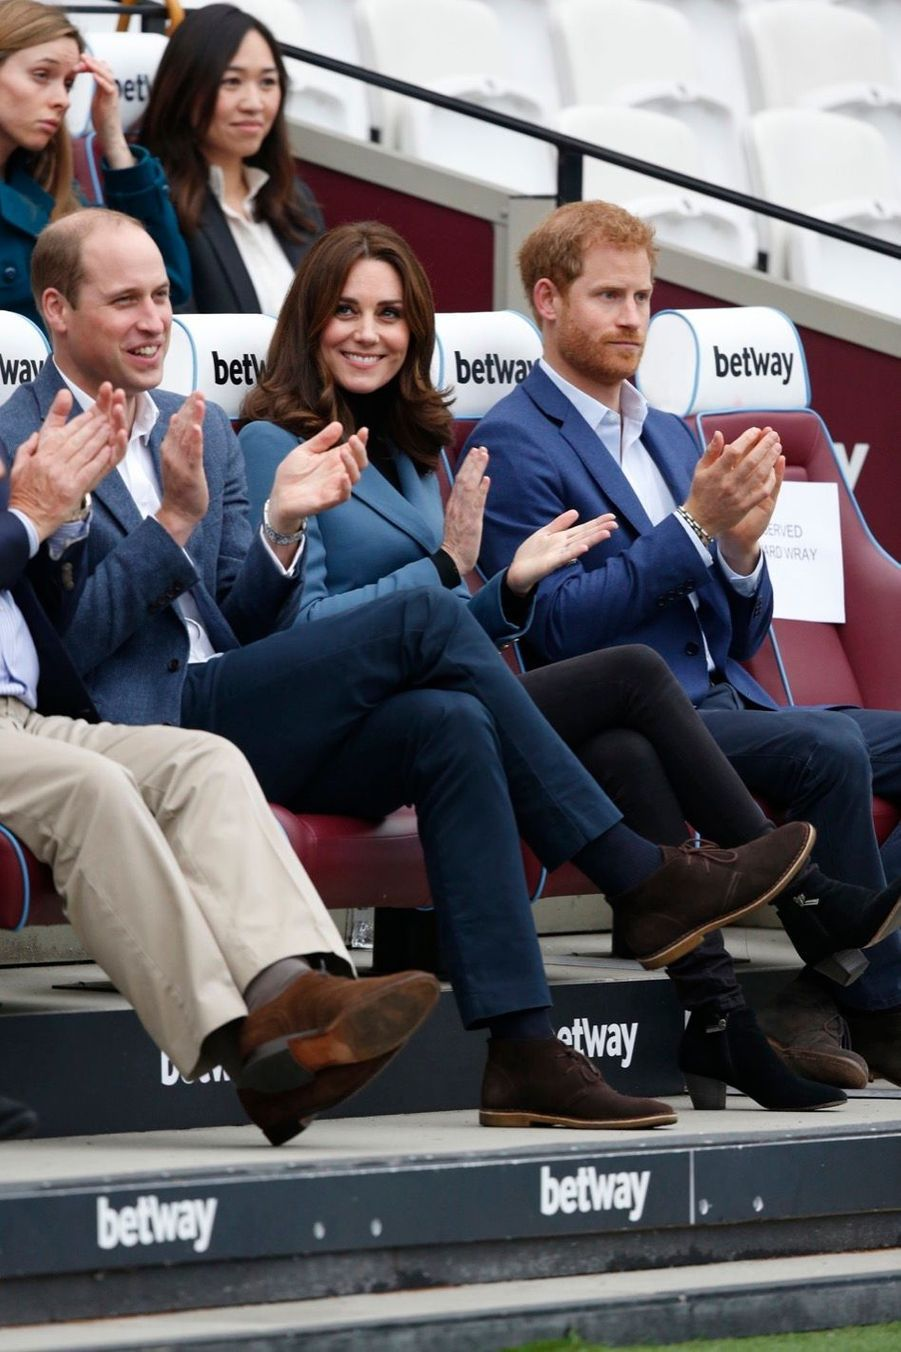 Kate, William Et Harry En Visite Au Stade De West Ham United 12